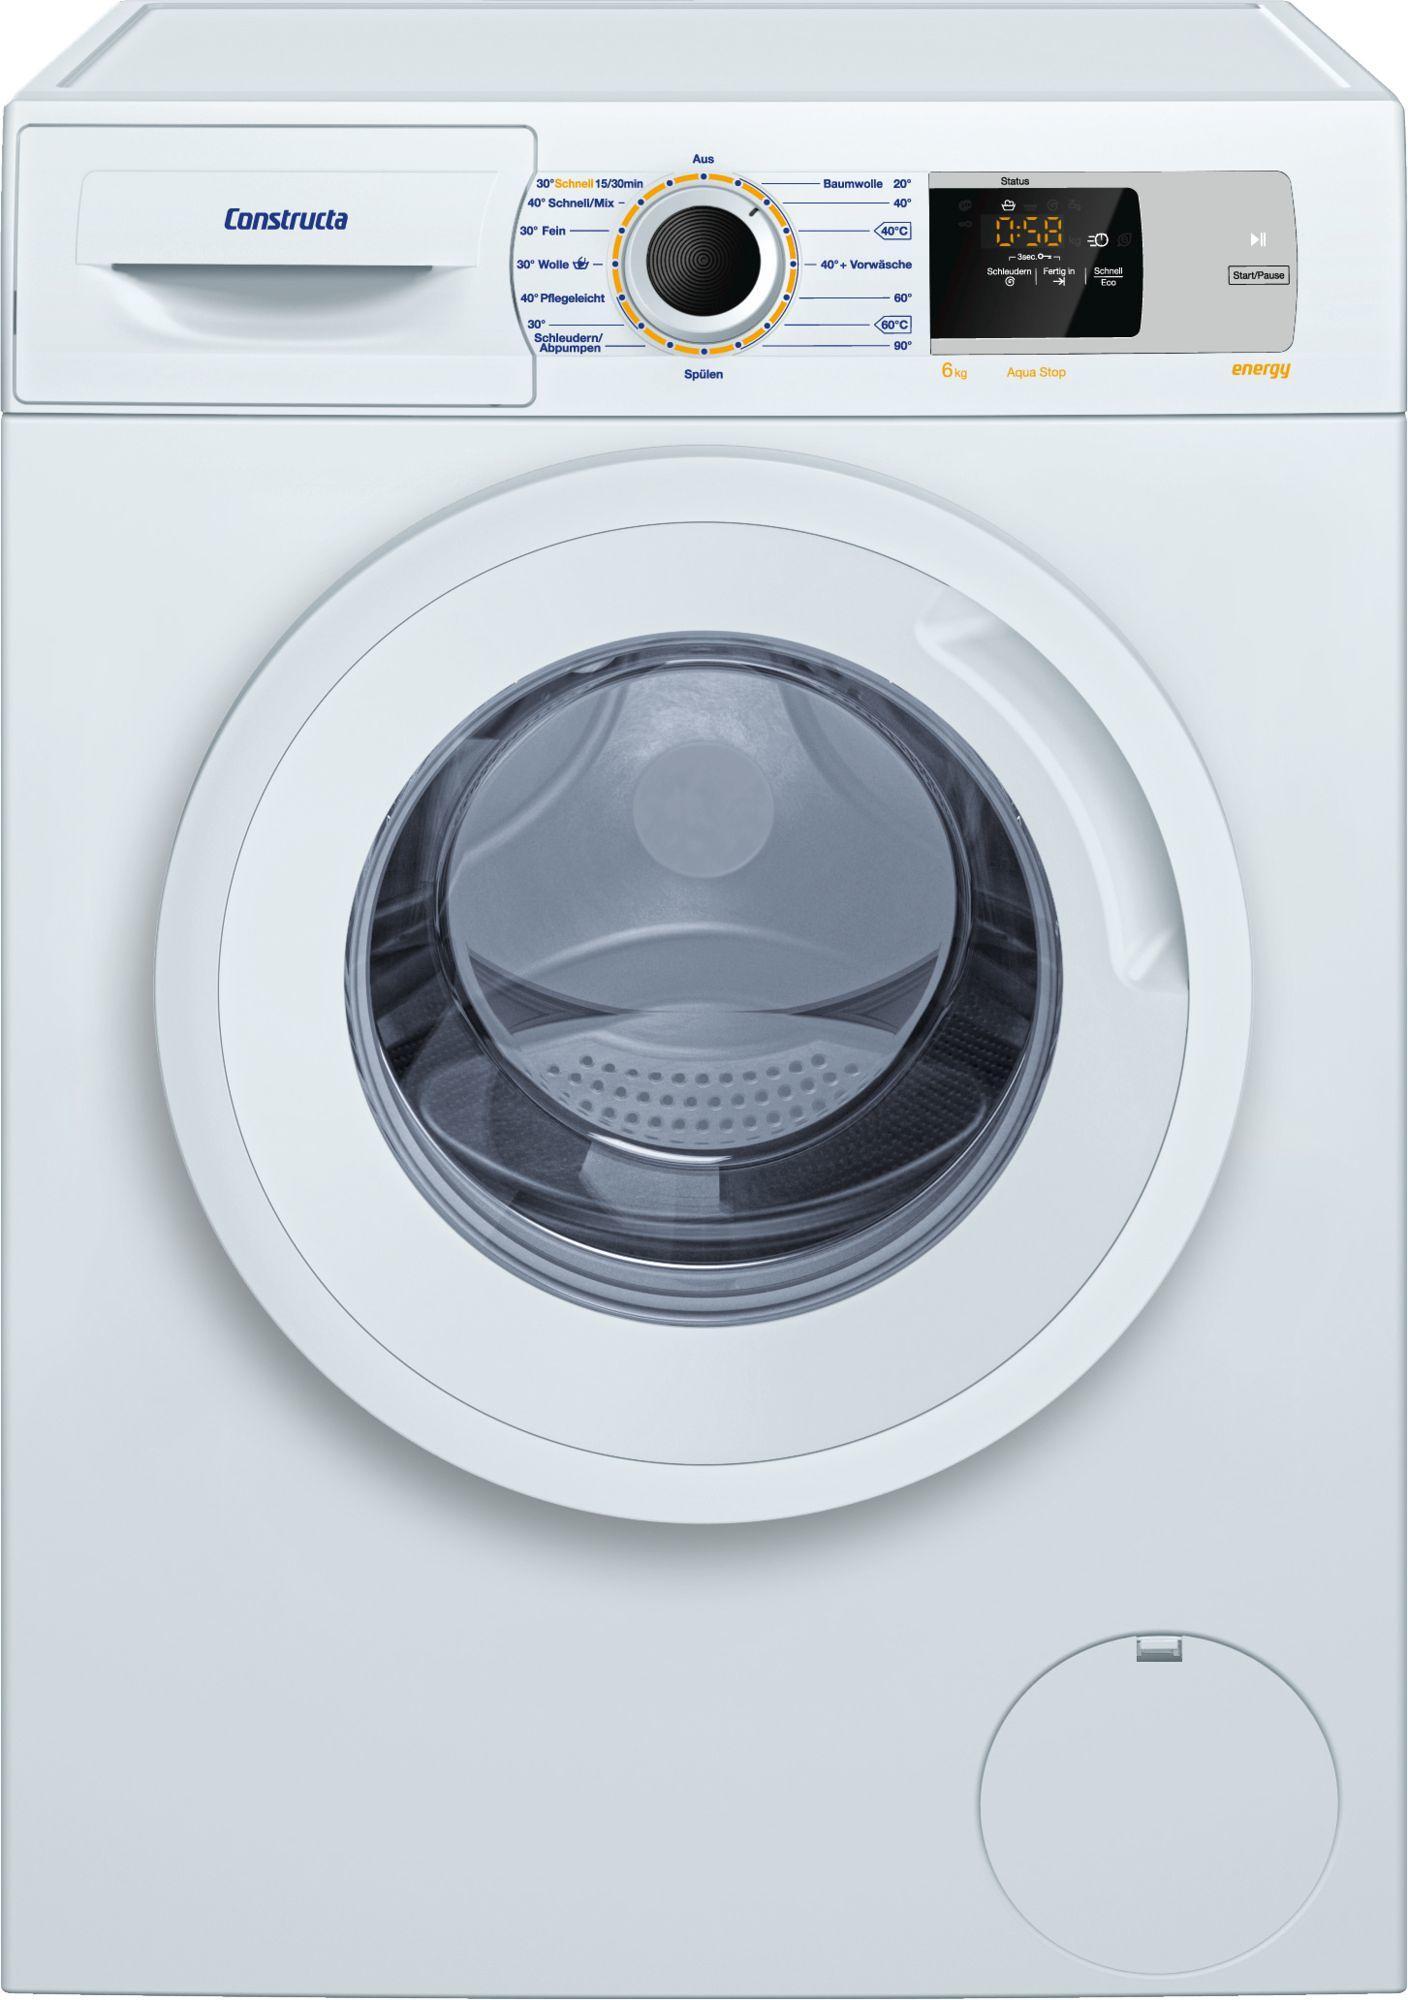 constructa cwf14n00 6kg a waschvollautomat 60 cm breit 1400 u min aquastop von constructa. Black Bedroom Furniture Sets. Home Design Ideas